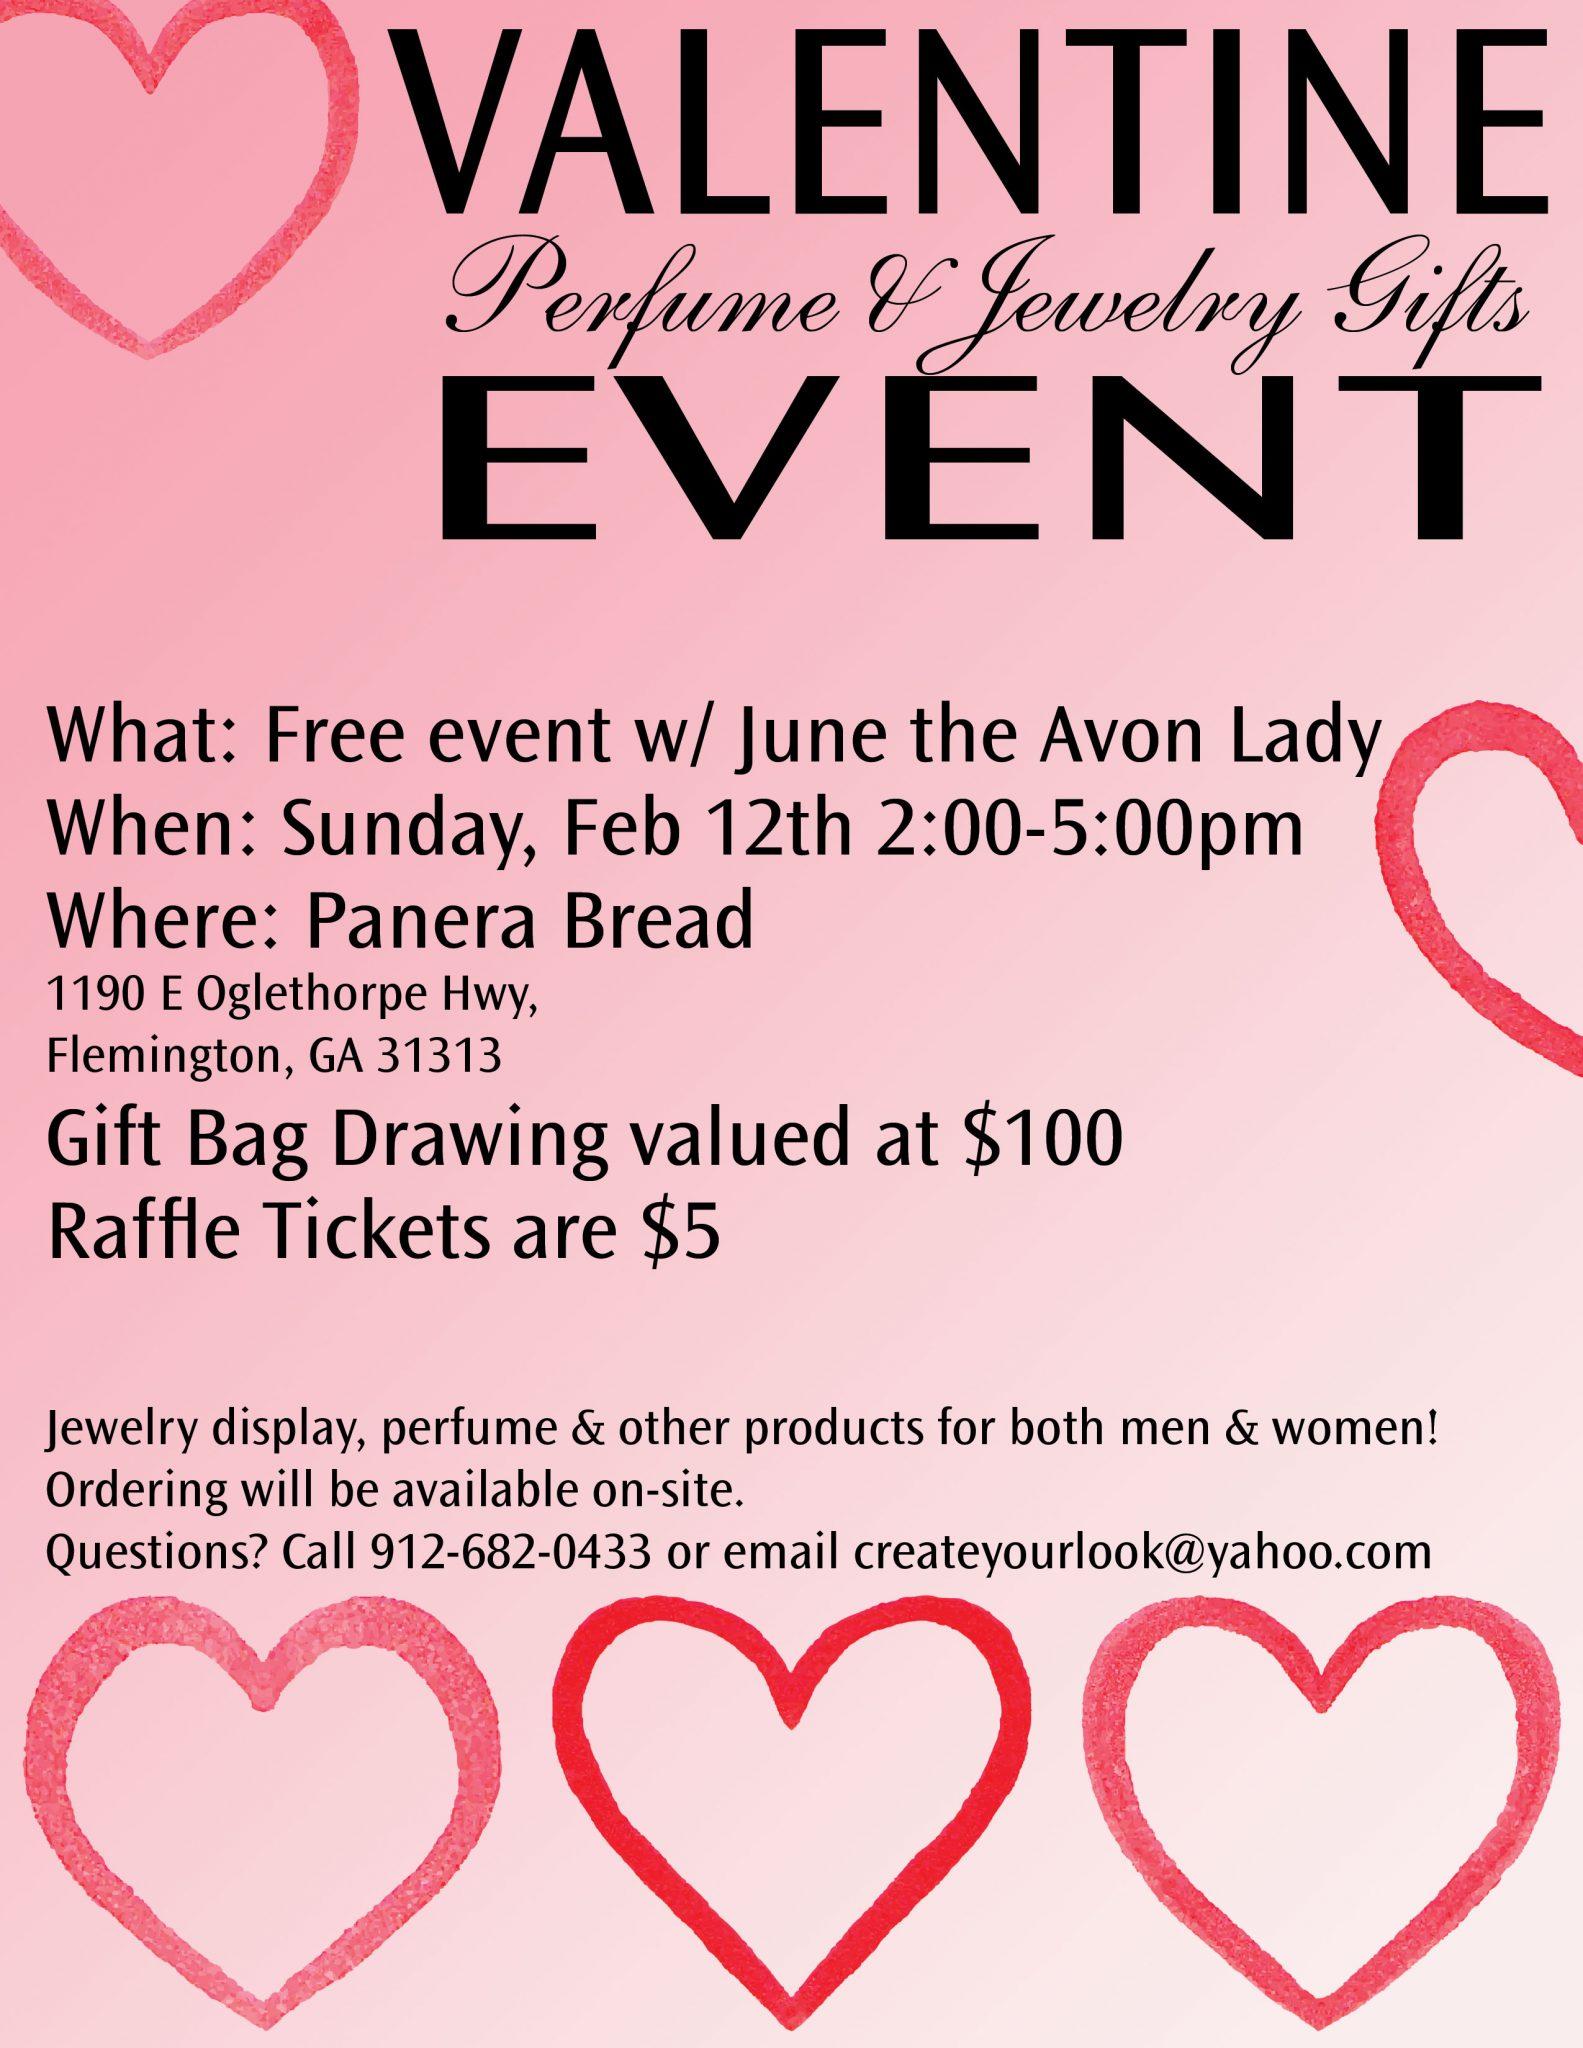 valentine perfume jewelry gifts event - Valentine Perfume